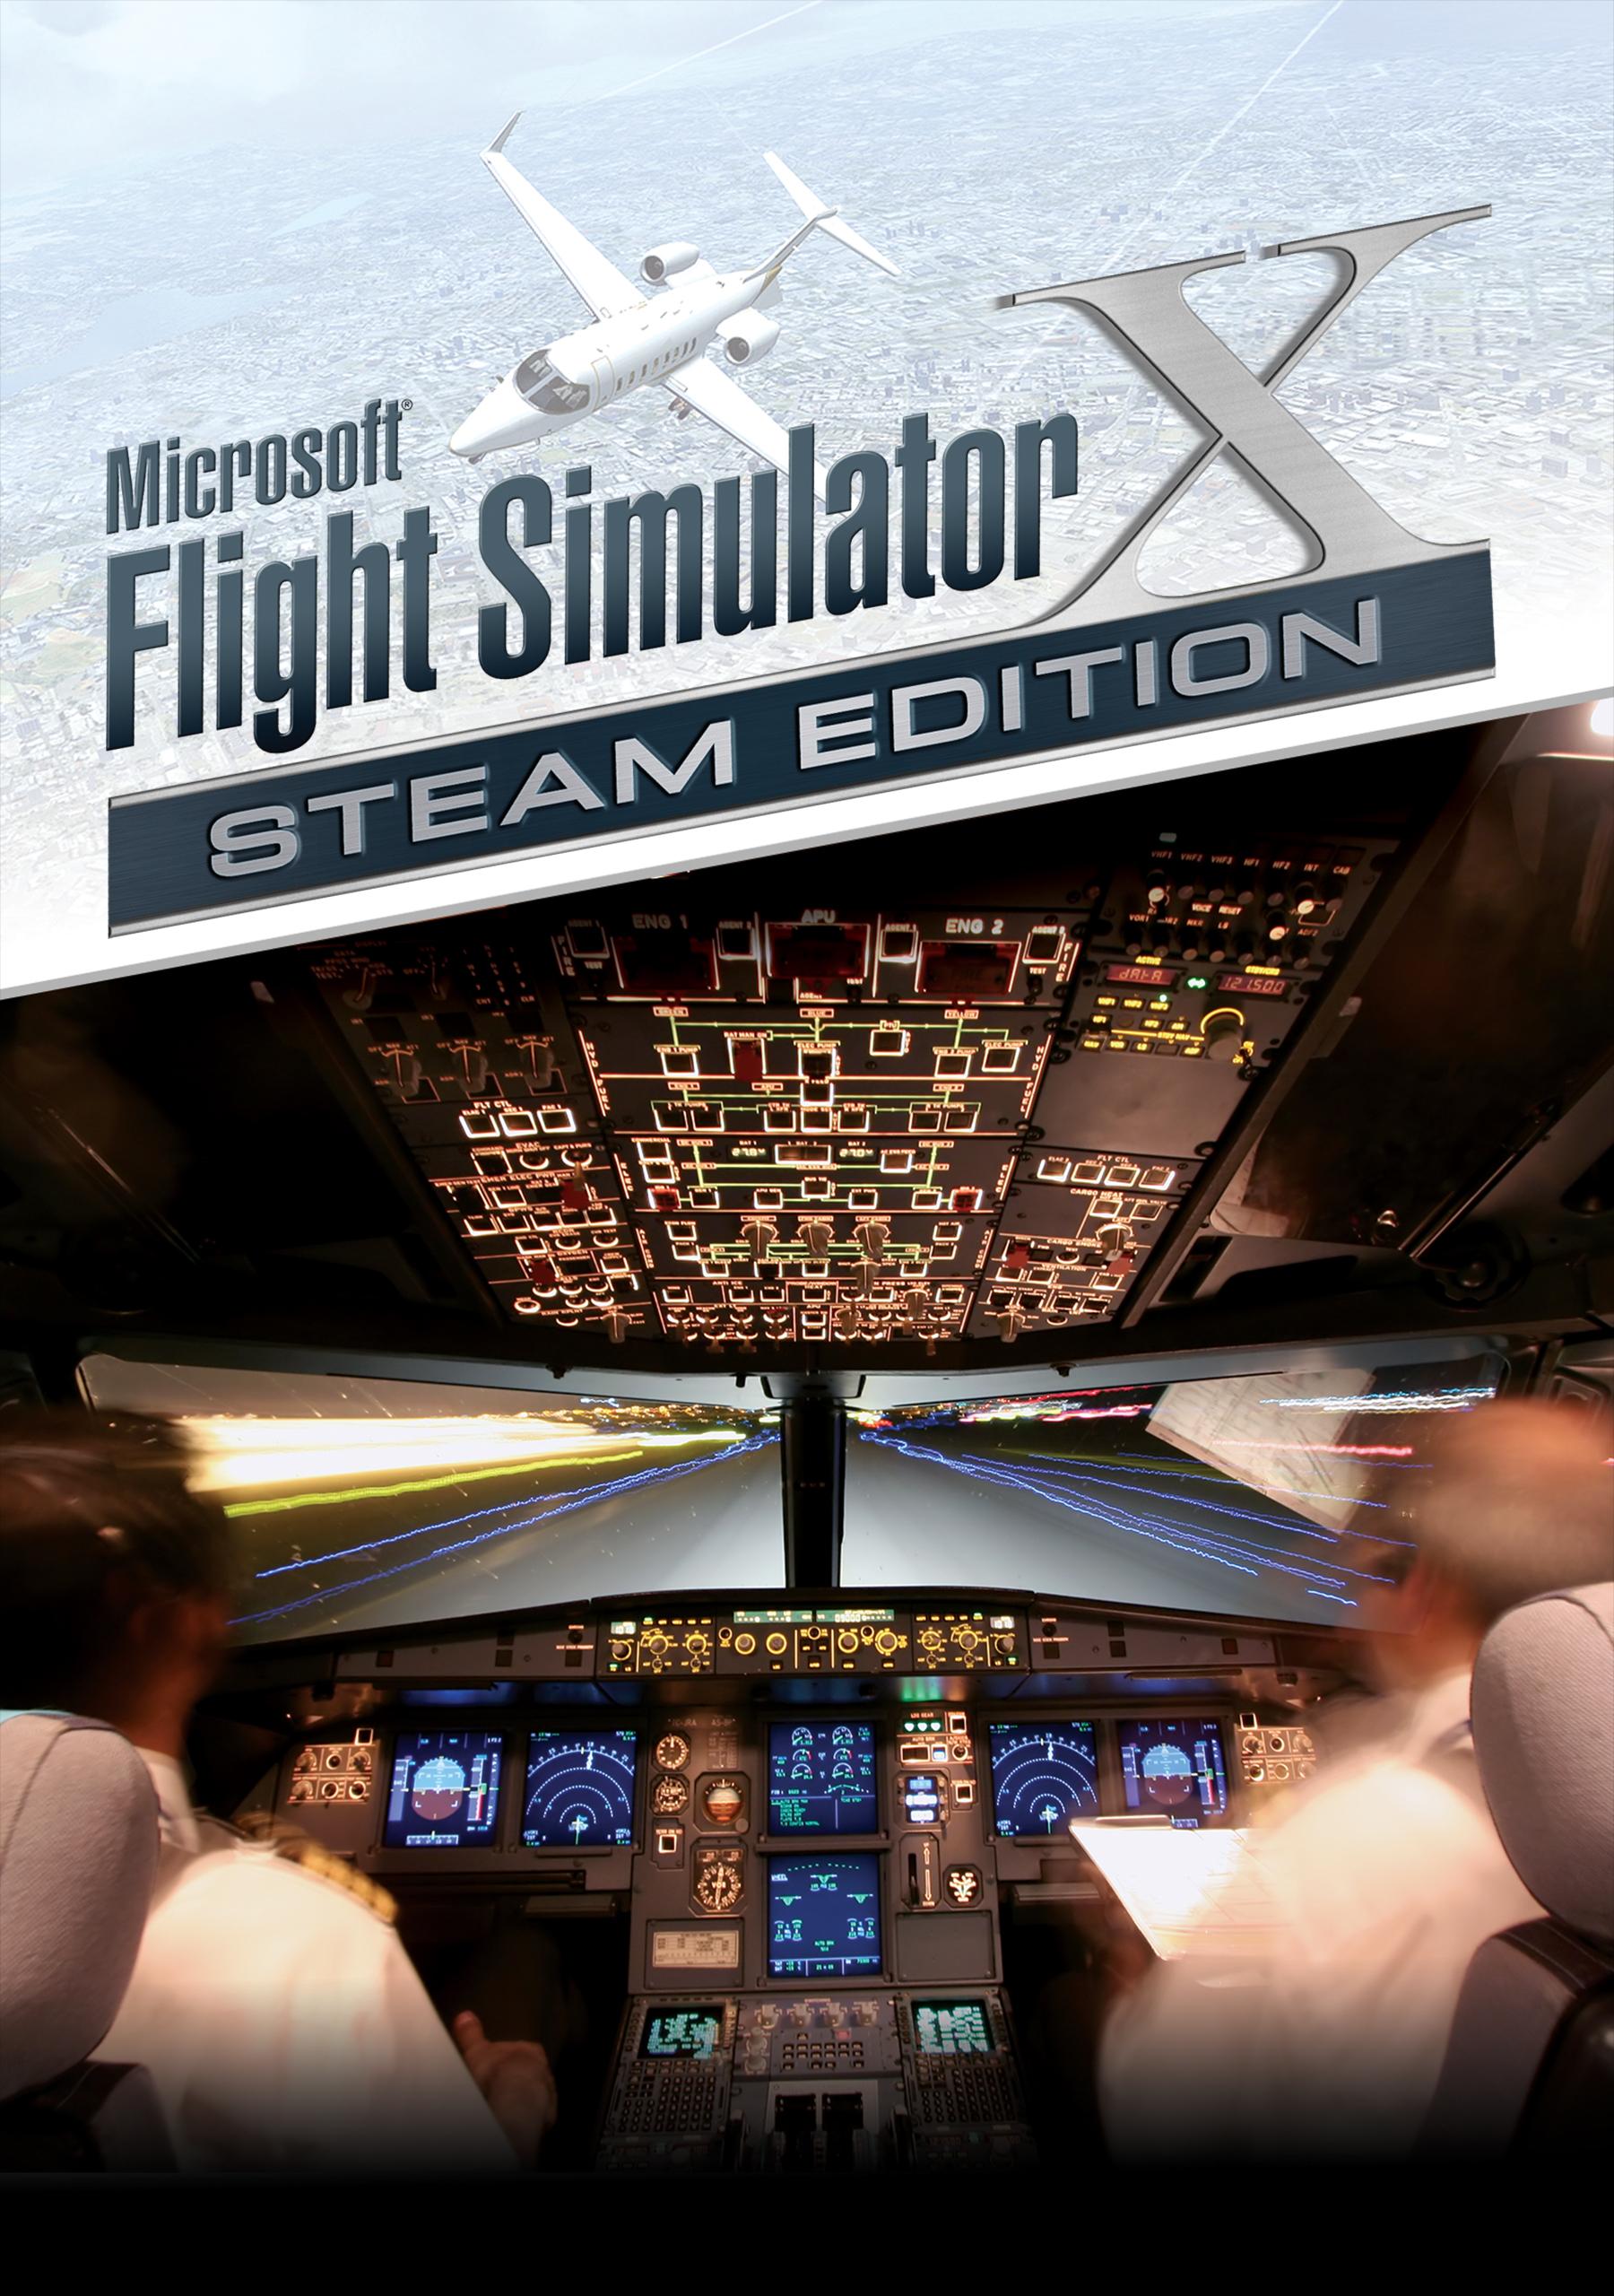 Amazon. Com: microsoft flight simulator x: steam edition [online.